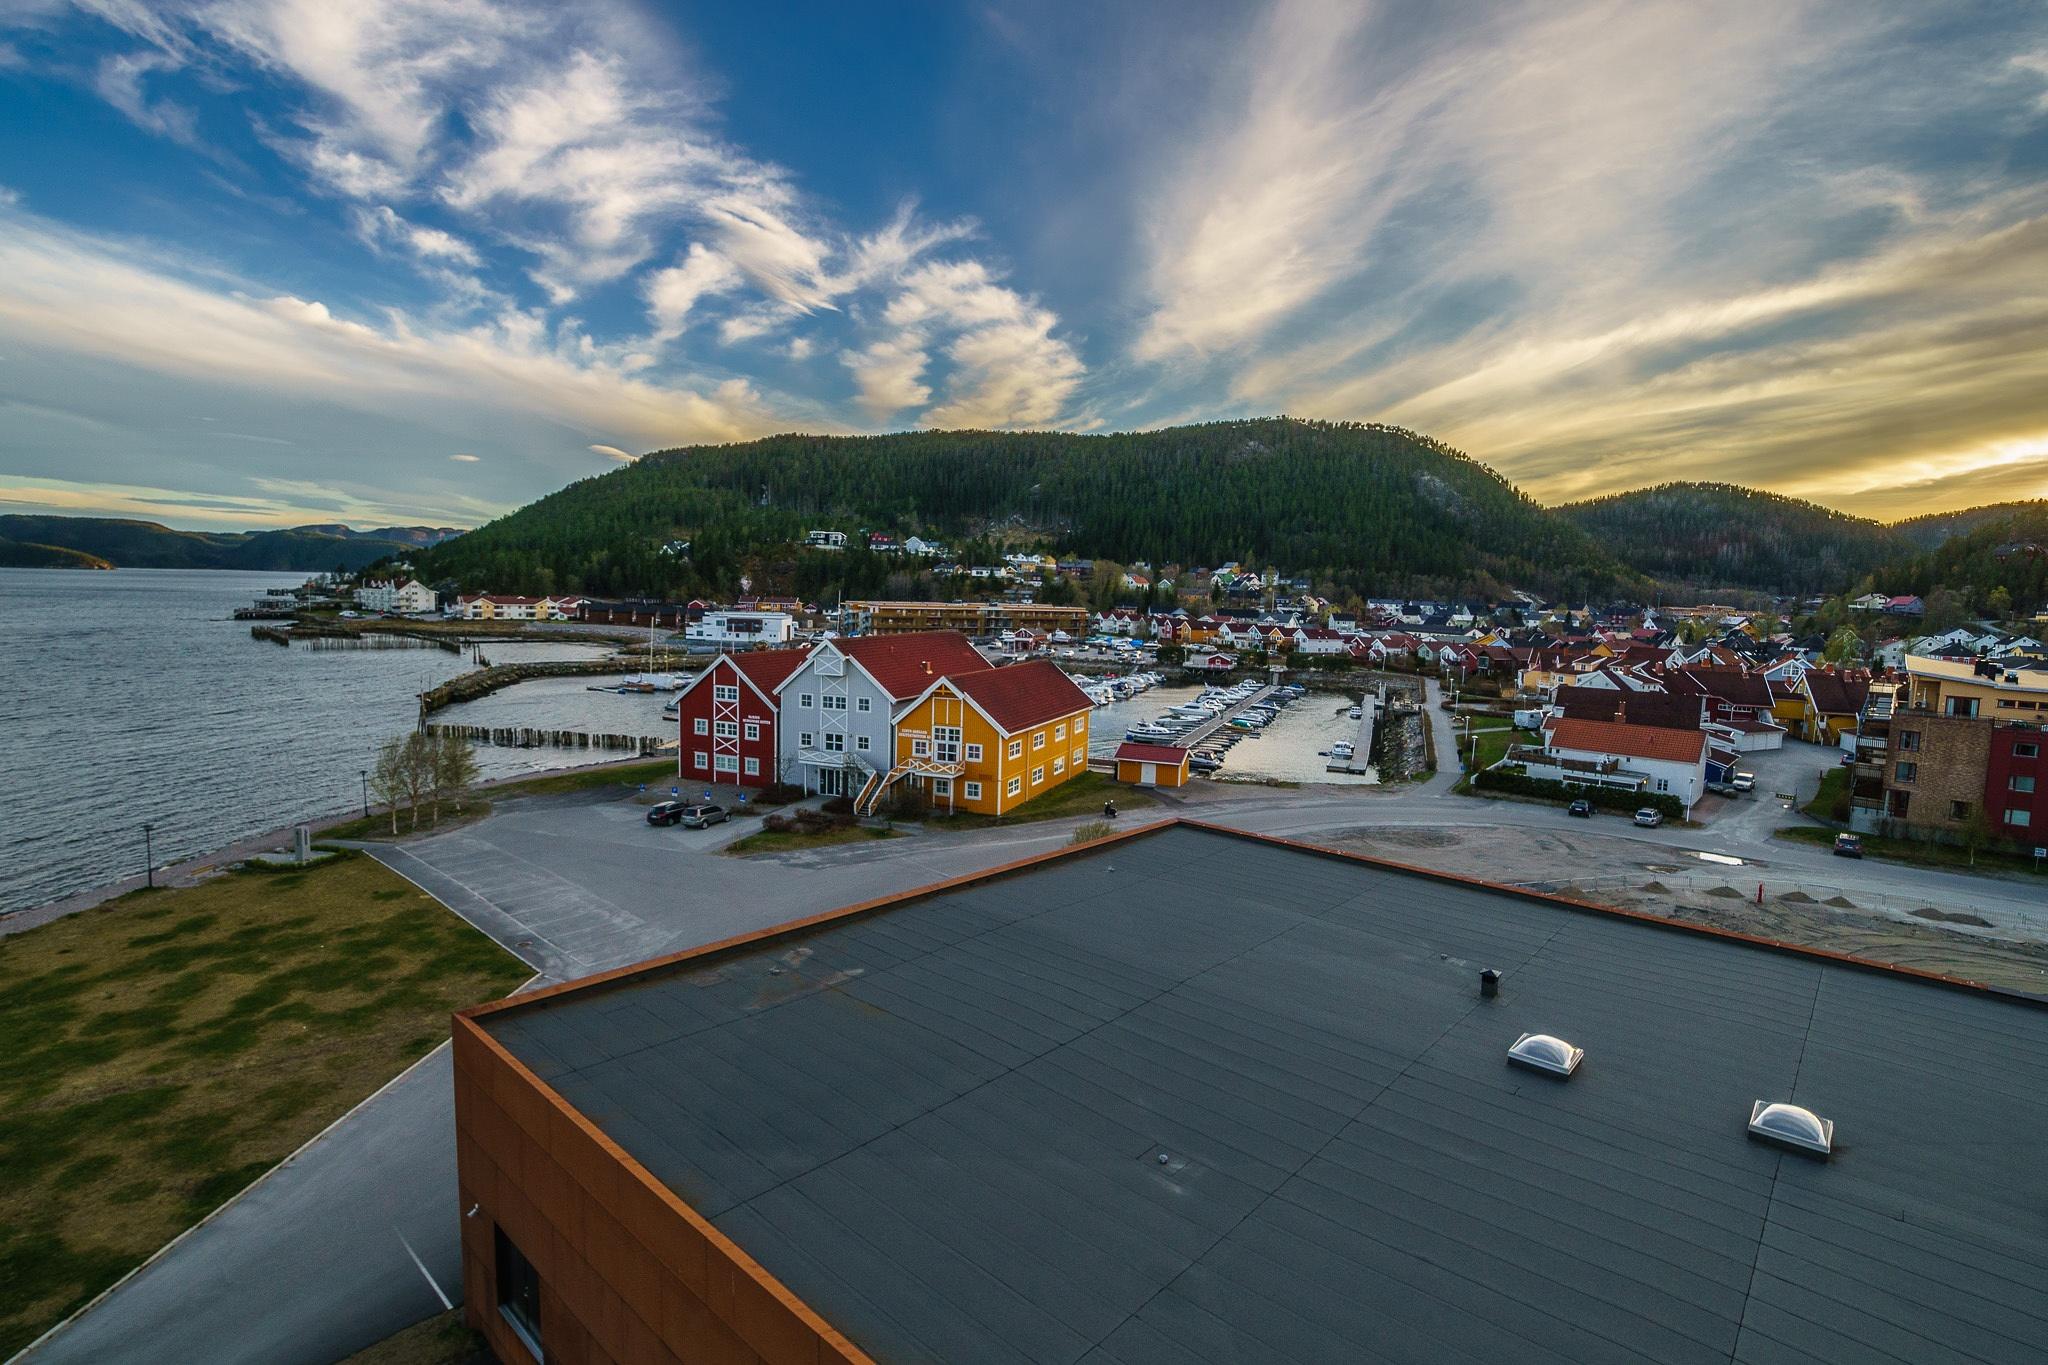 Morning in Namsos by Jens-Chr.